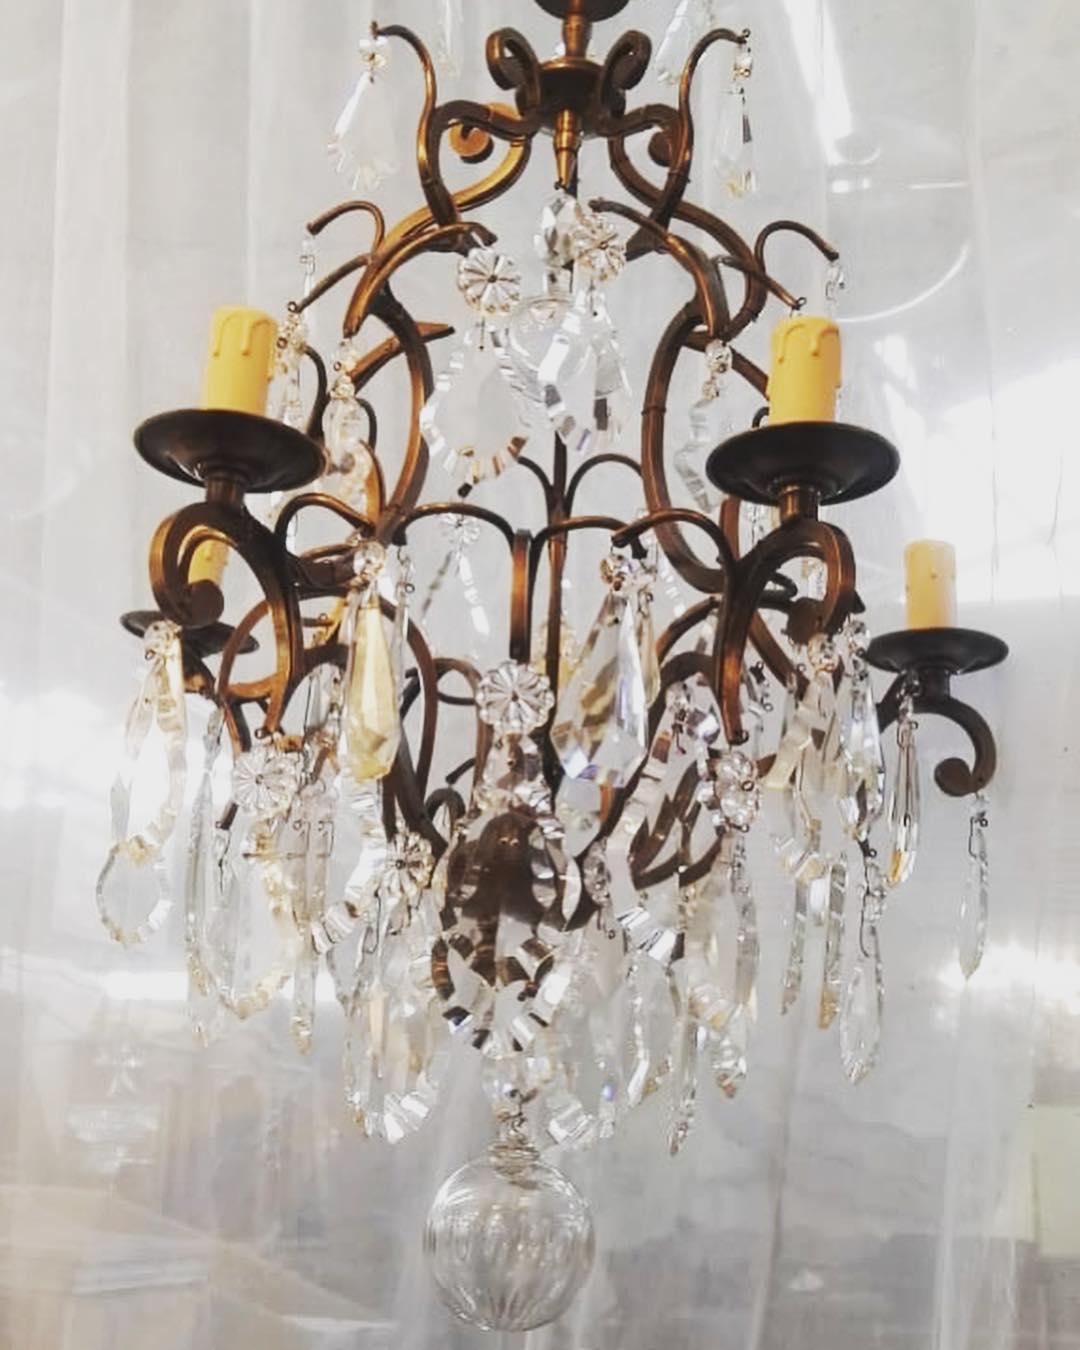 Projeto de cliente de lâmpada de vidro bronze antigo @lamparas_los_angelitos # design ...